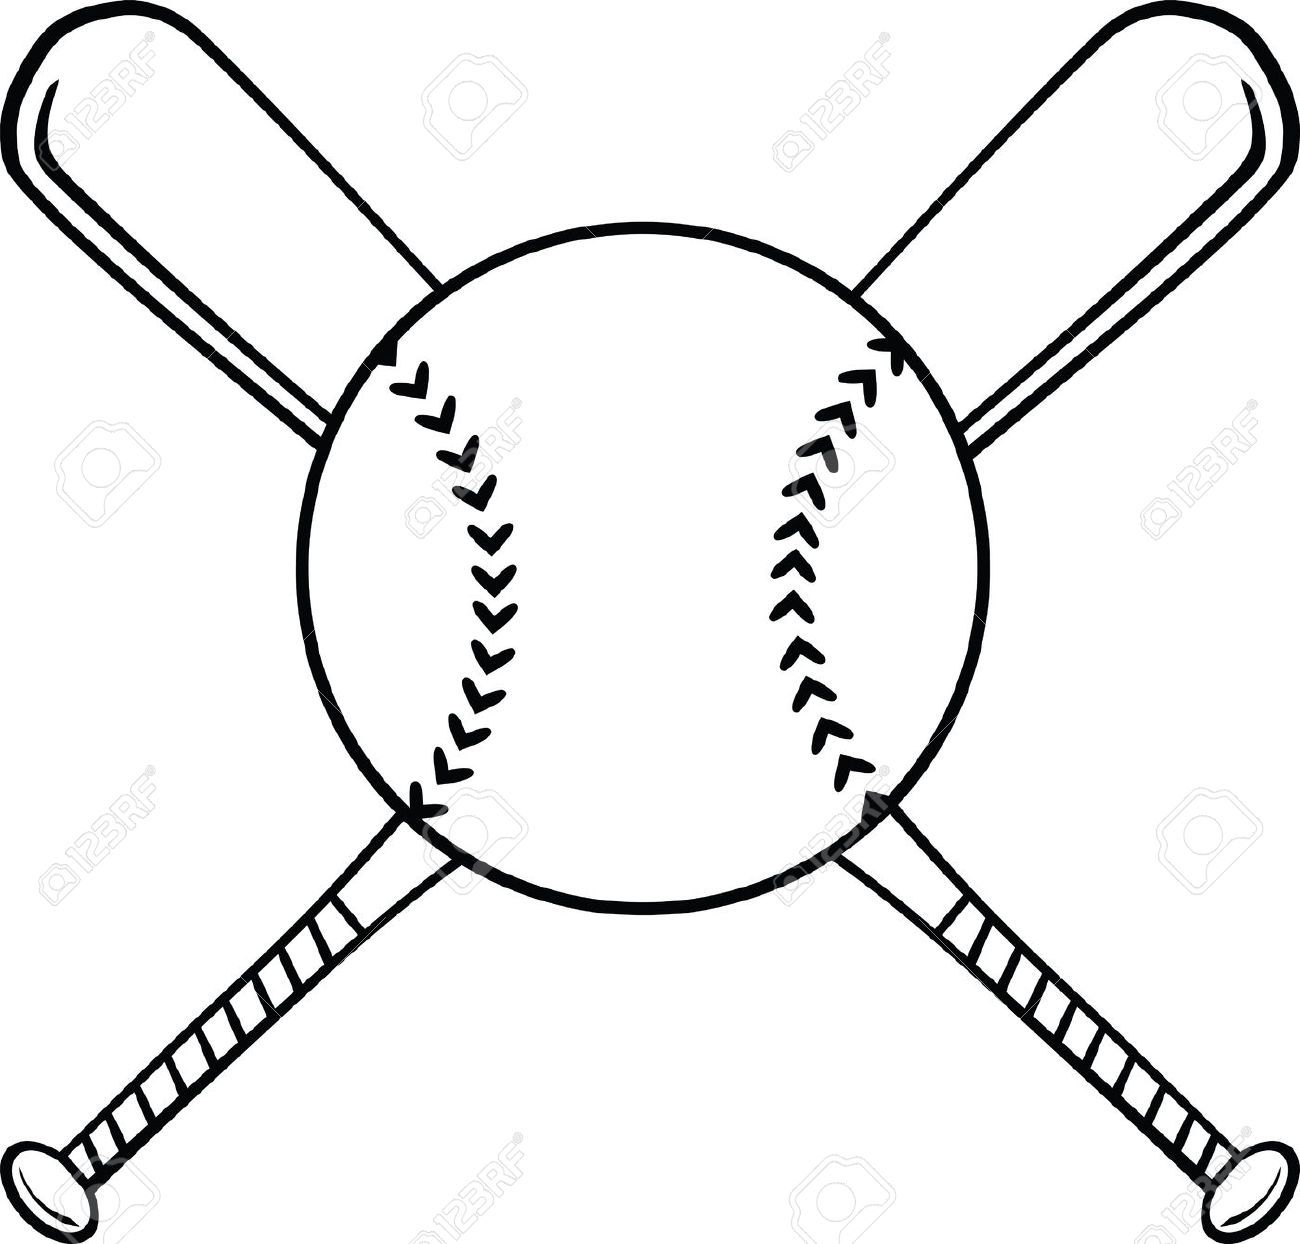 hight resolution of softball ball and bat clipart clipartfox